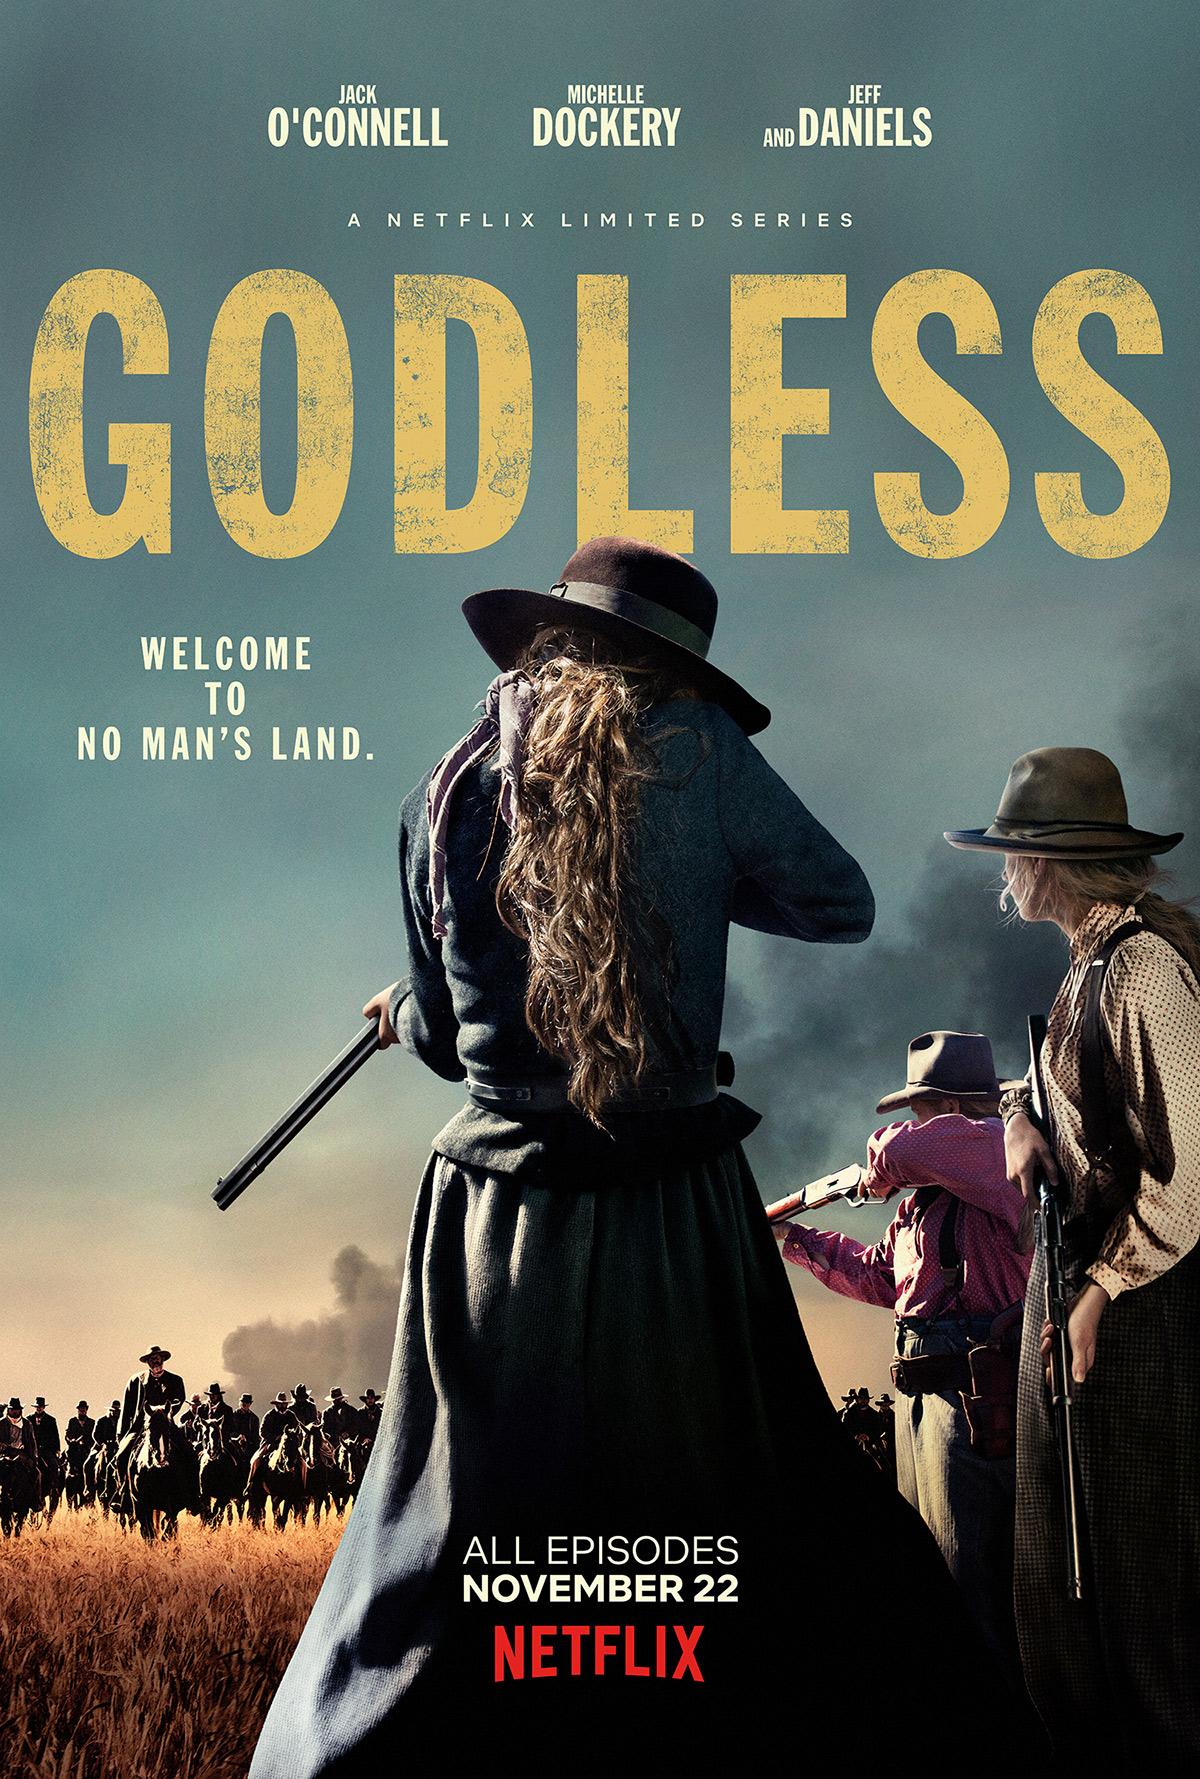 Godless: Série western com Jeff Daniels e Michelle Dockery ganha ...